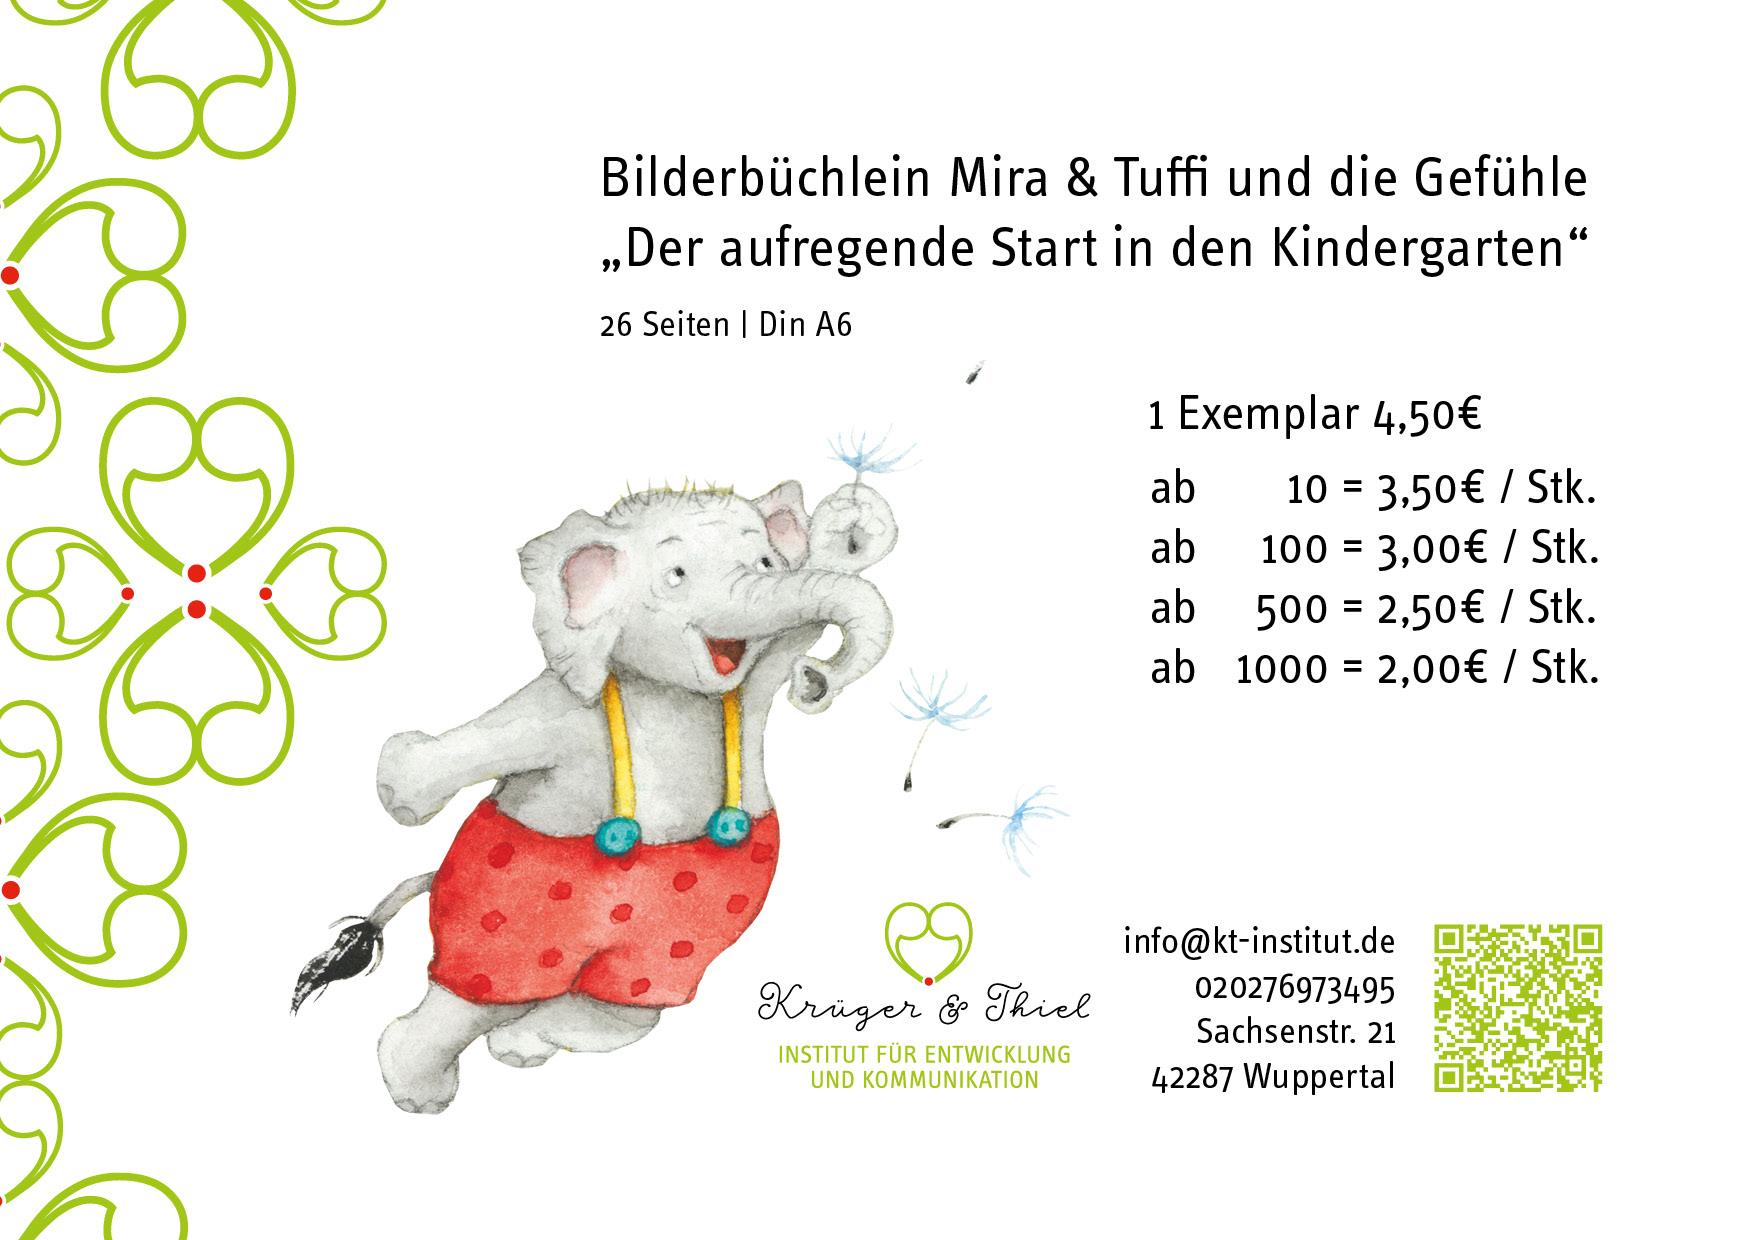 Staffelpreise Mira und Tuffi